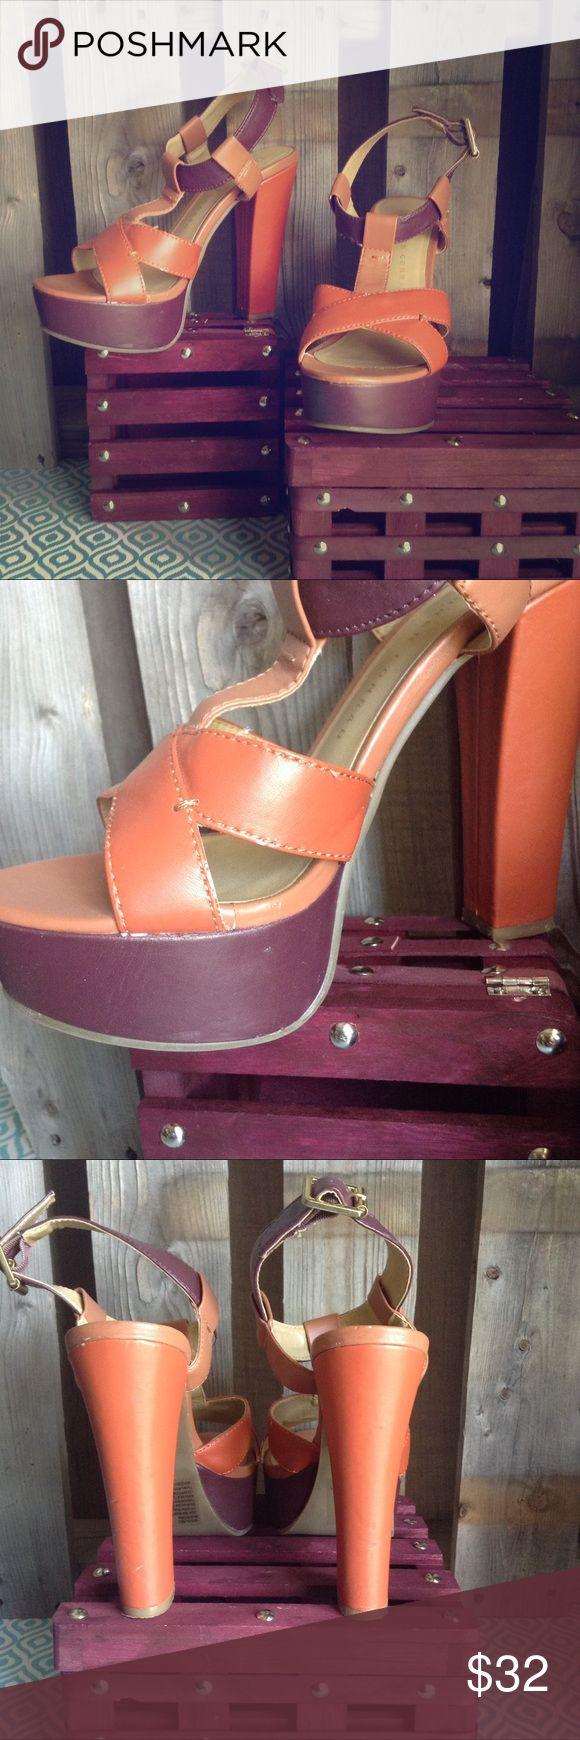 Lauren Conrad  tri-color block platform heel sz6.5 Lovely warm orange, purple, tan colors. Chunky heel. Good used condition. All wear shown.  Size 6.5 LC Lauren Conrad Shoes Heels